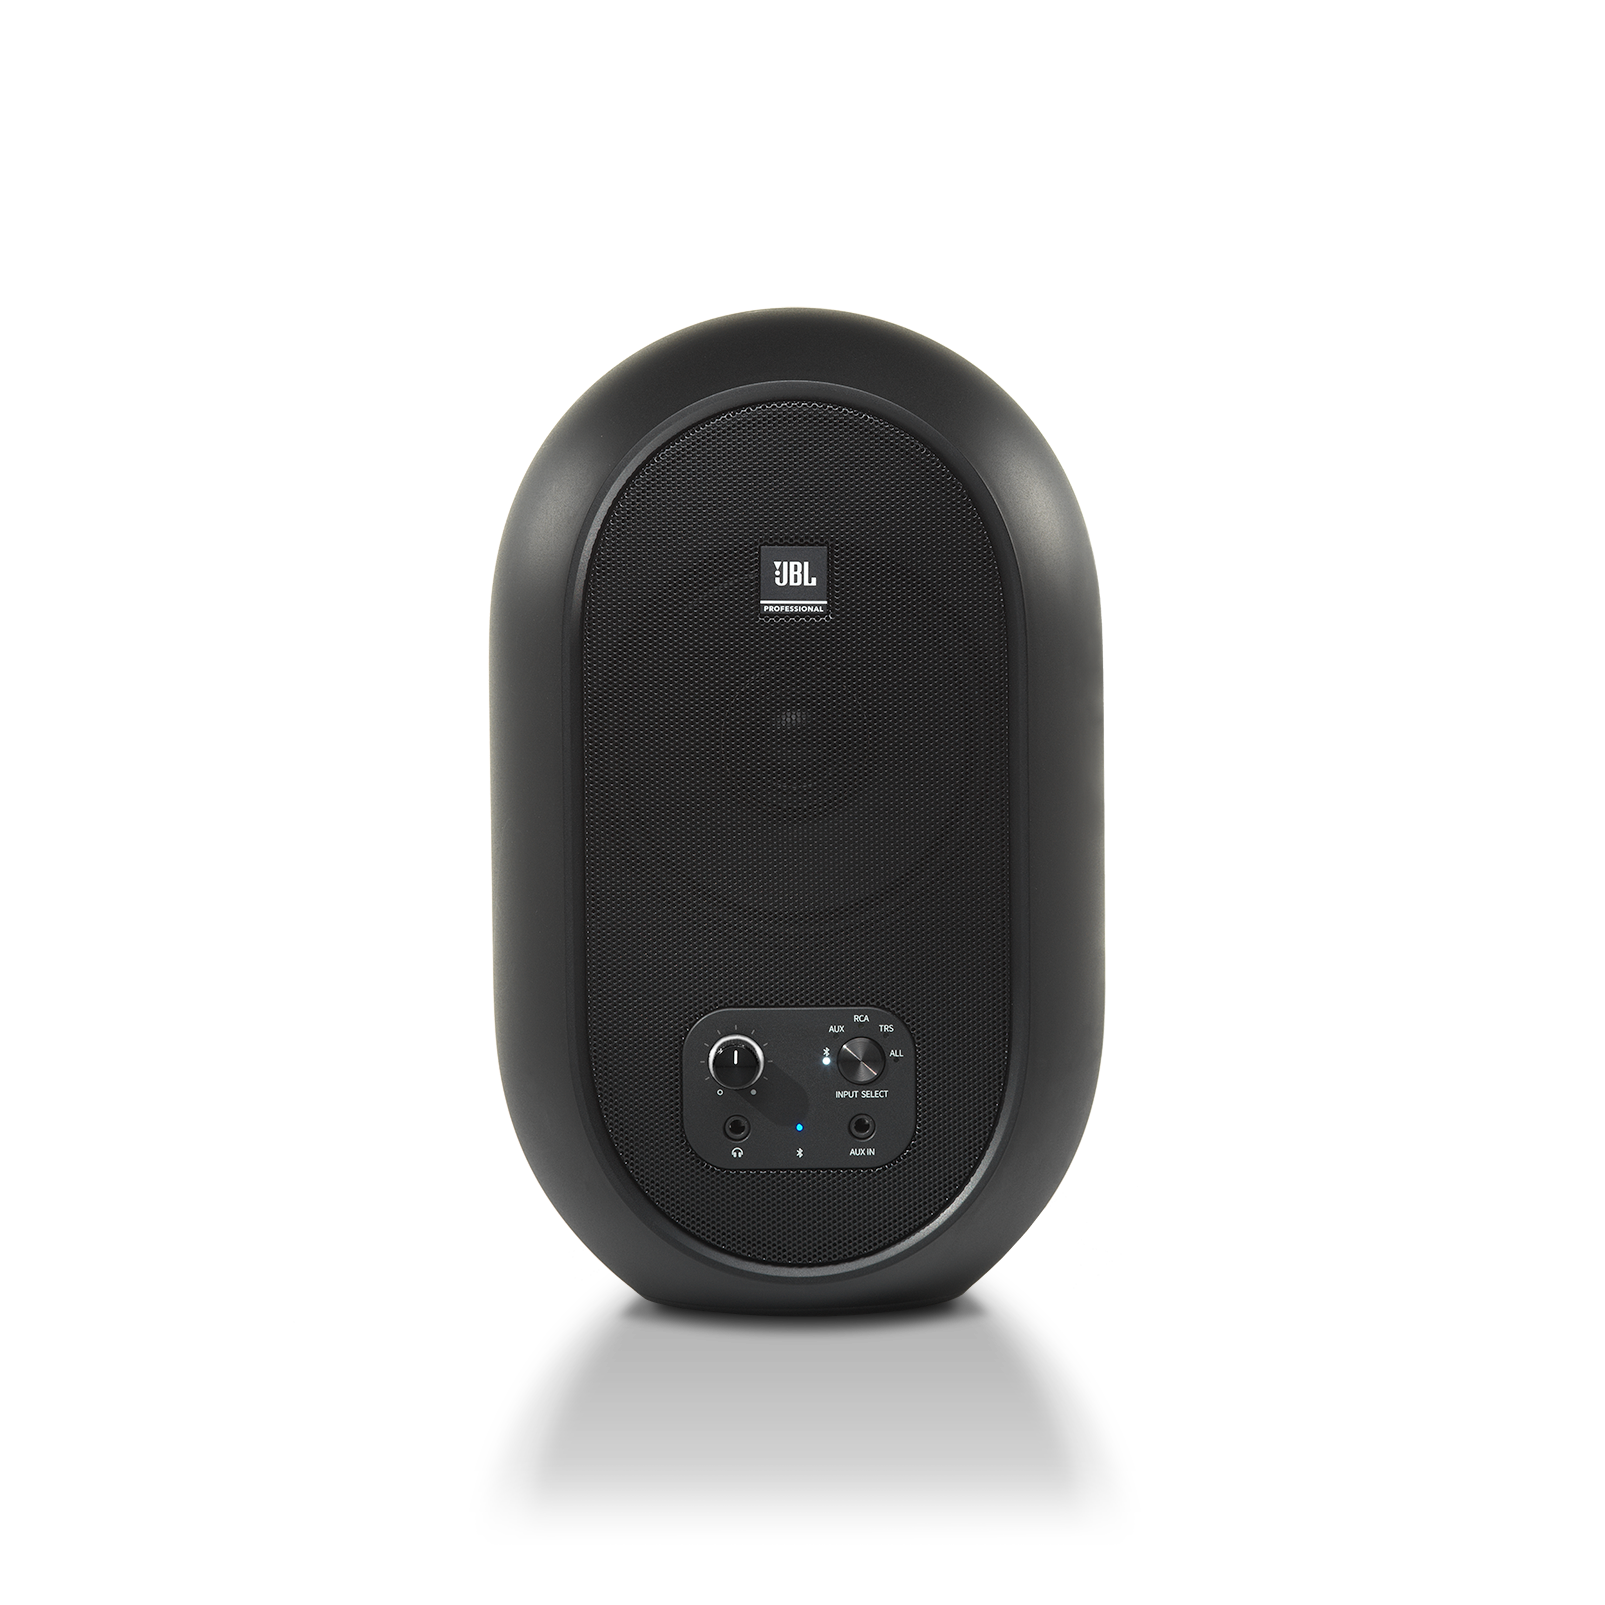 JBL 104-BT (Pair) - Black - Compact Desktop Reference Monitors with Bluetooth - Detailshot 2